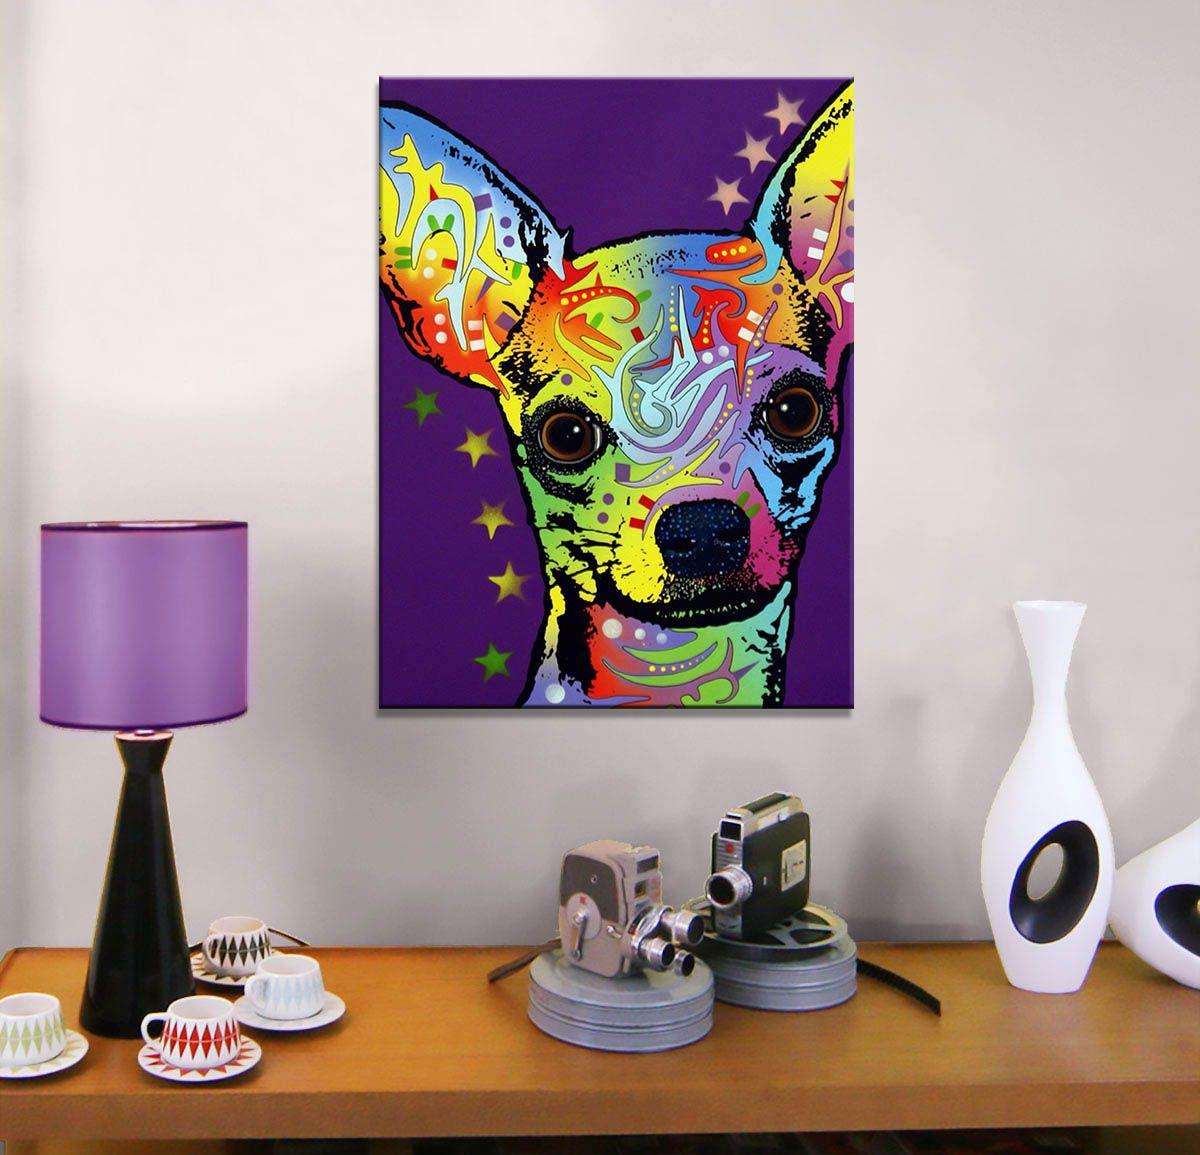 Großhandel Drucken Ölgemälde Wandmalerei Chihuahua Hause Dekorative ...